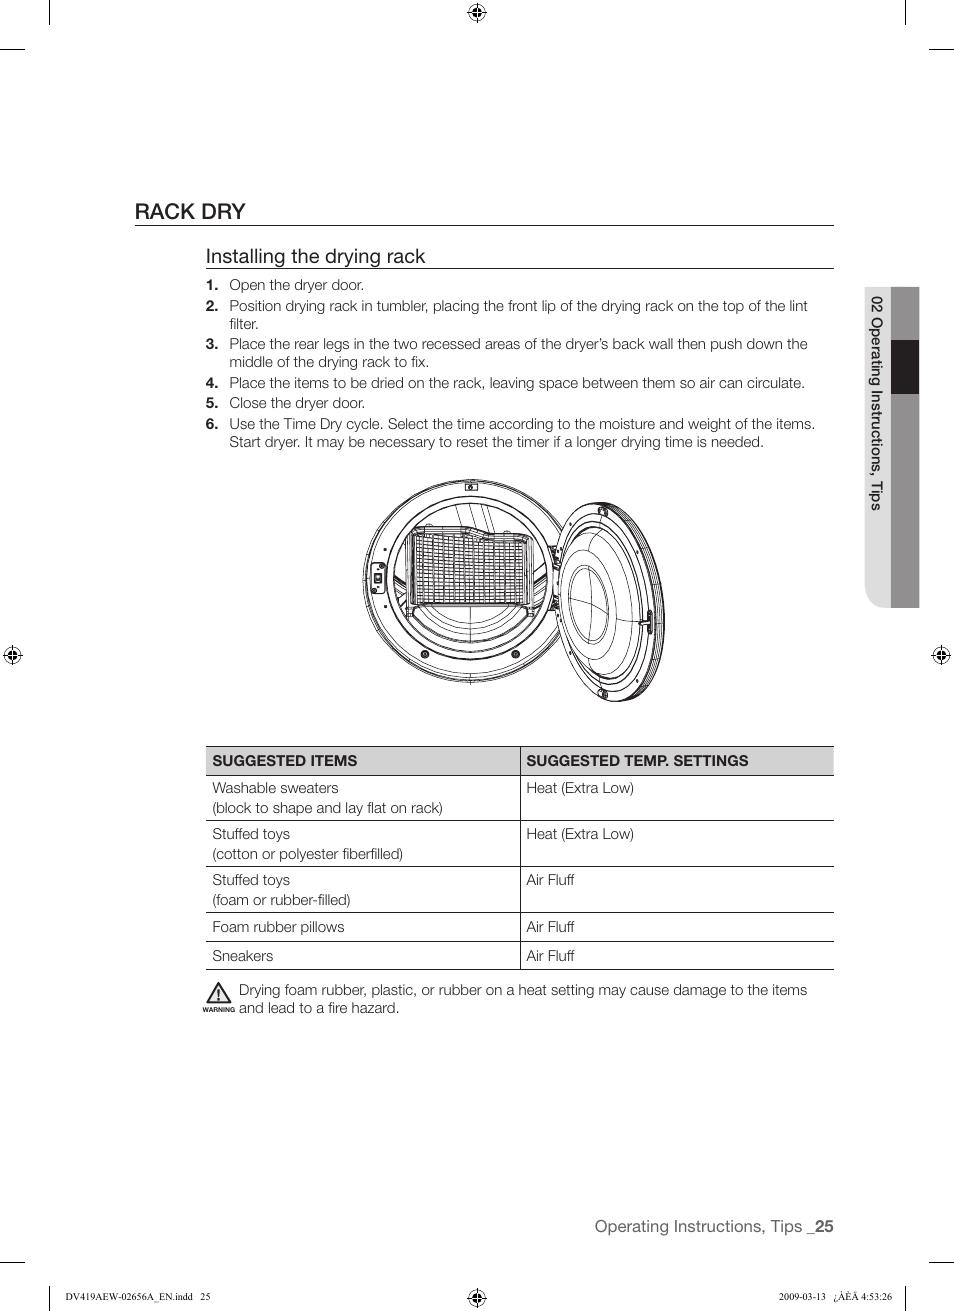 rack dry installing the drying rack samsung dv419aeu xaa user rh manualsdir com samsung dryer dv419aew/xaa troubleshooting